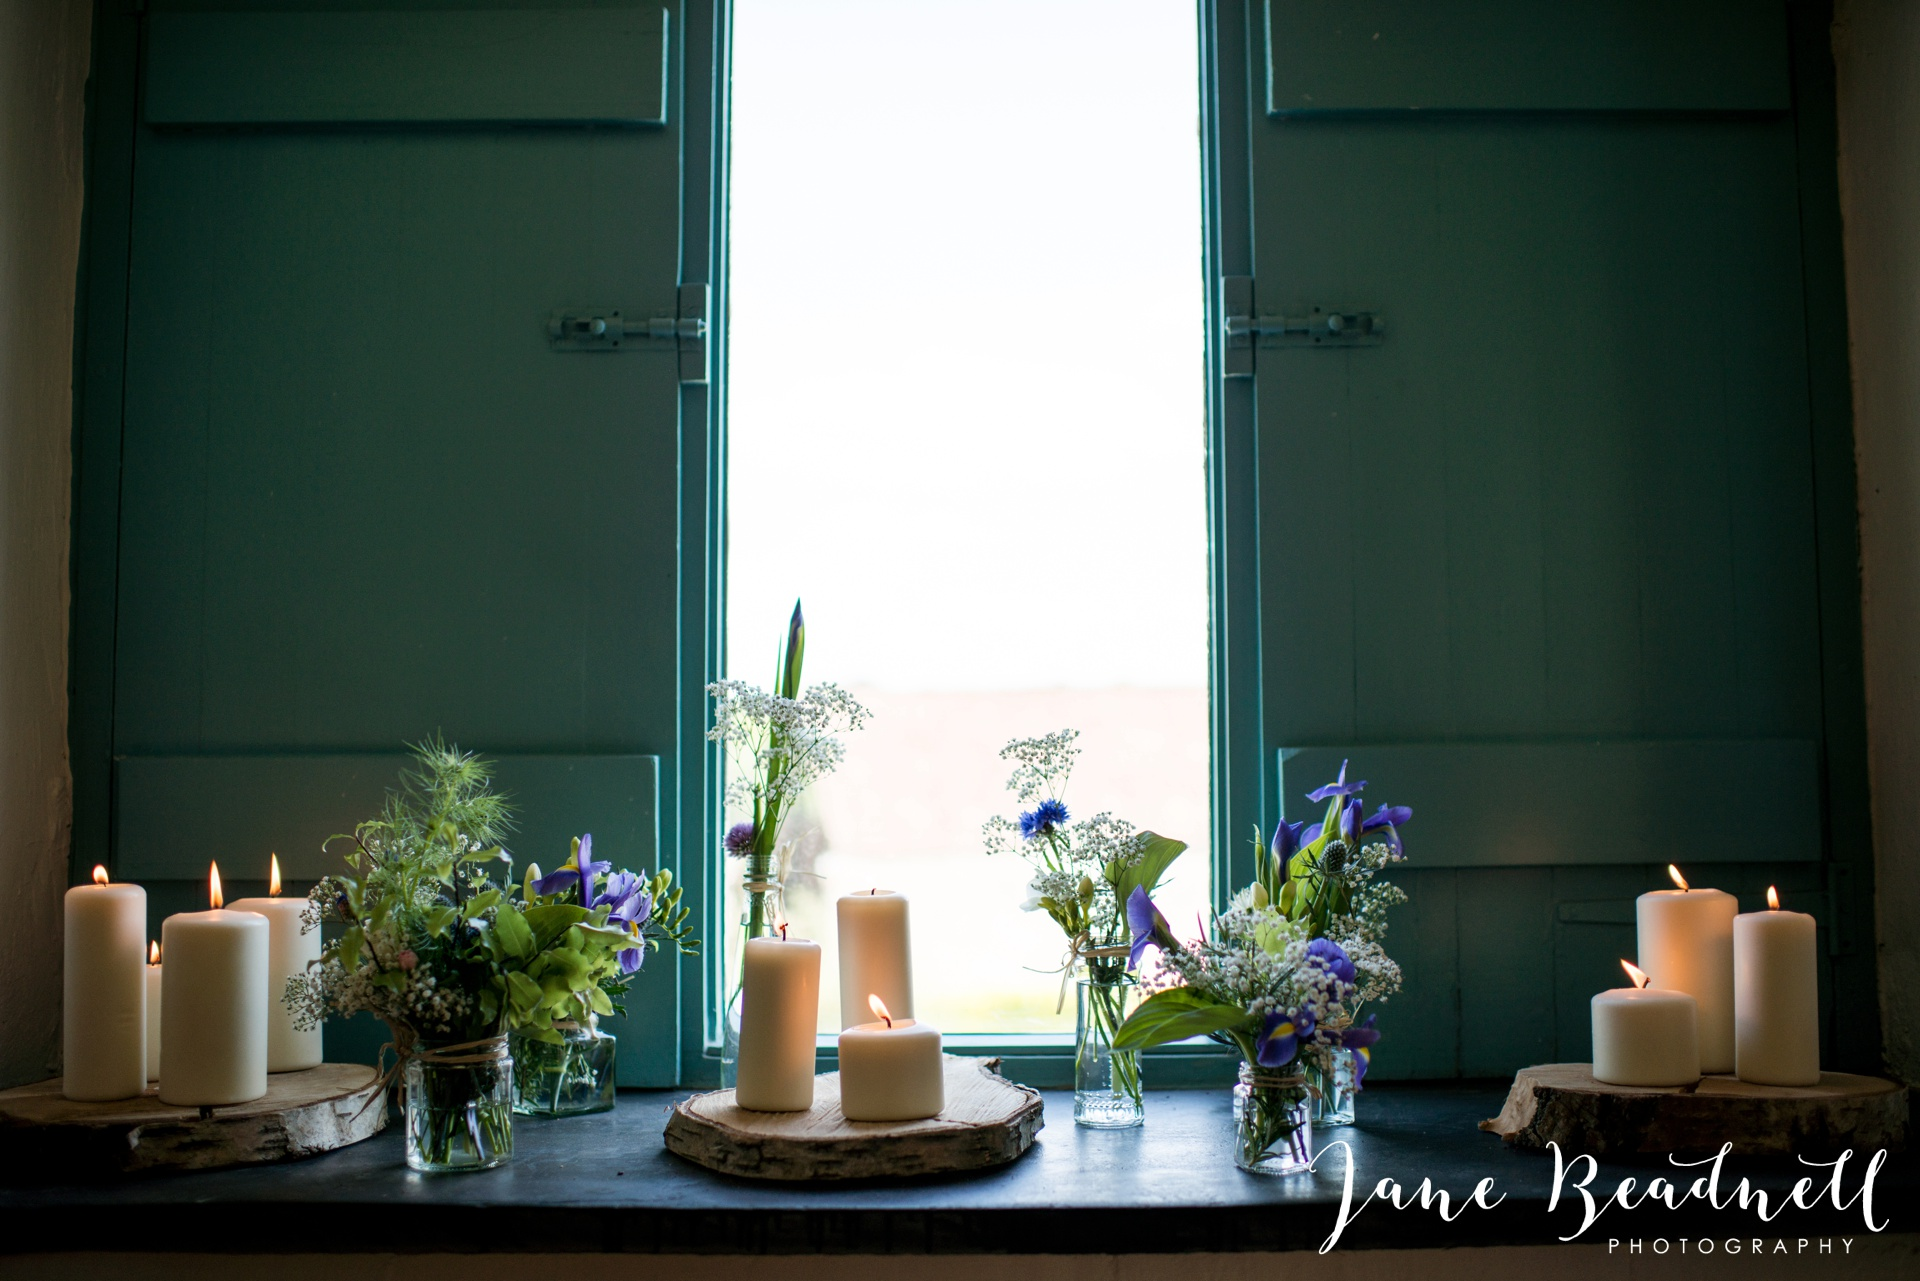 Bath Abbey wedding photography by fine art wedding photographer Leeds Jane Beadnell_23